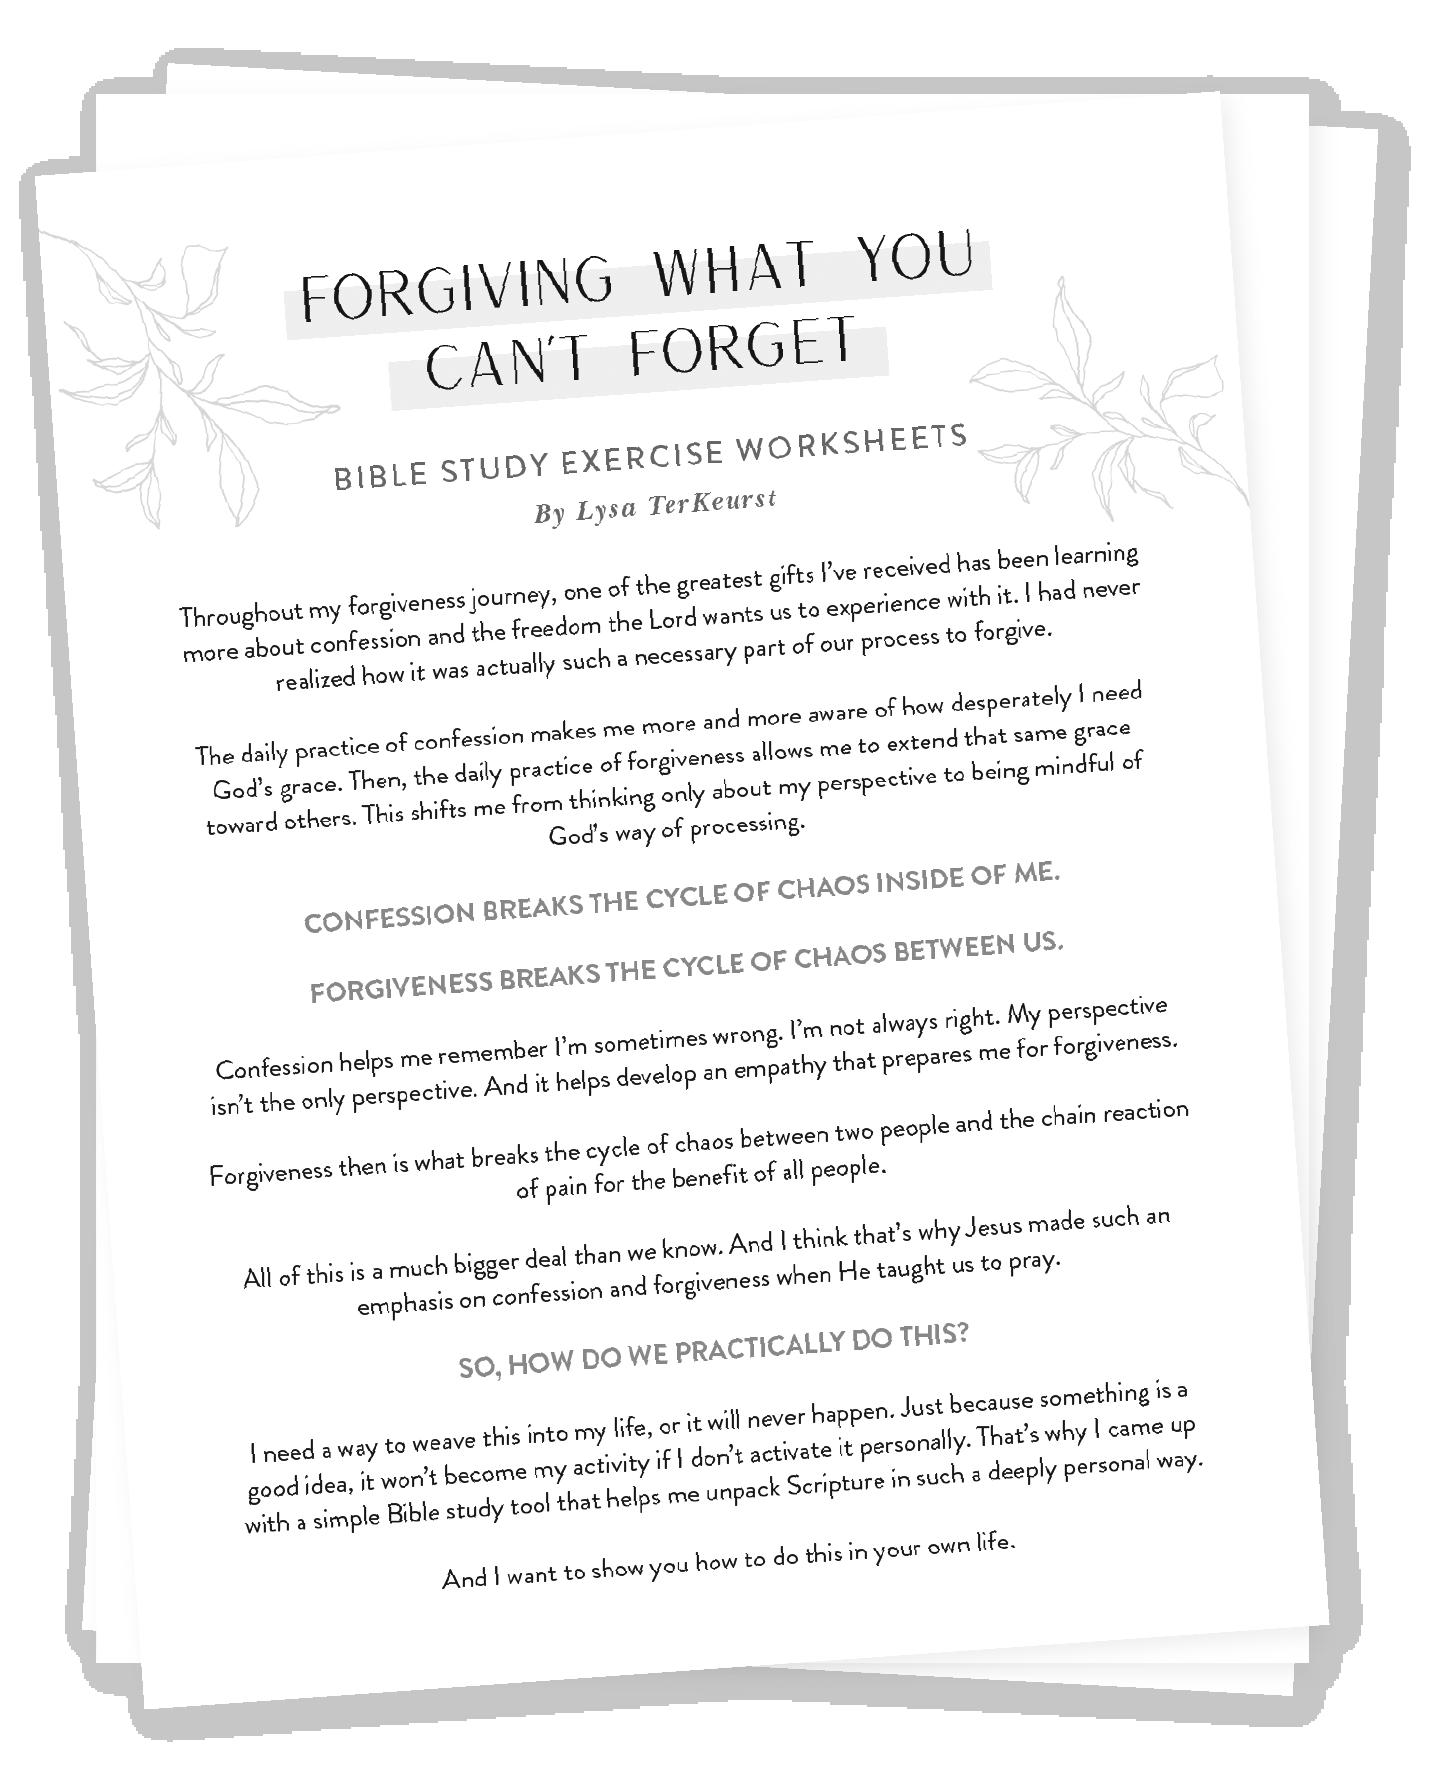 Bible Study Exercise Worksheets Image